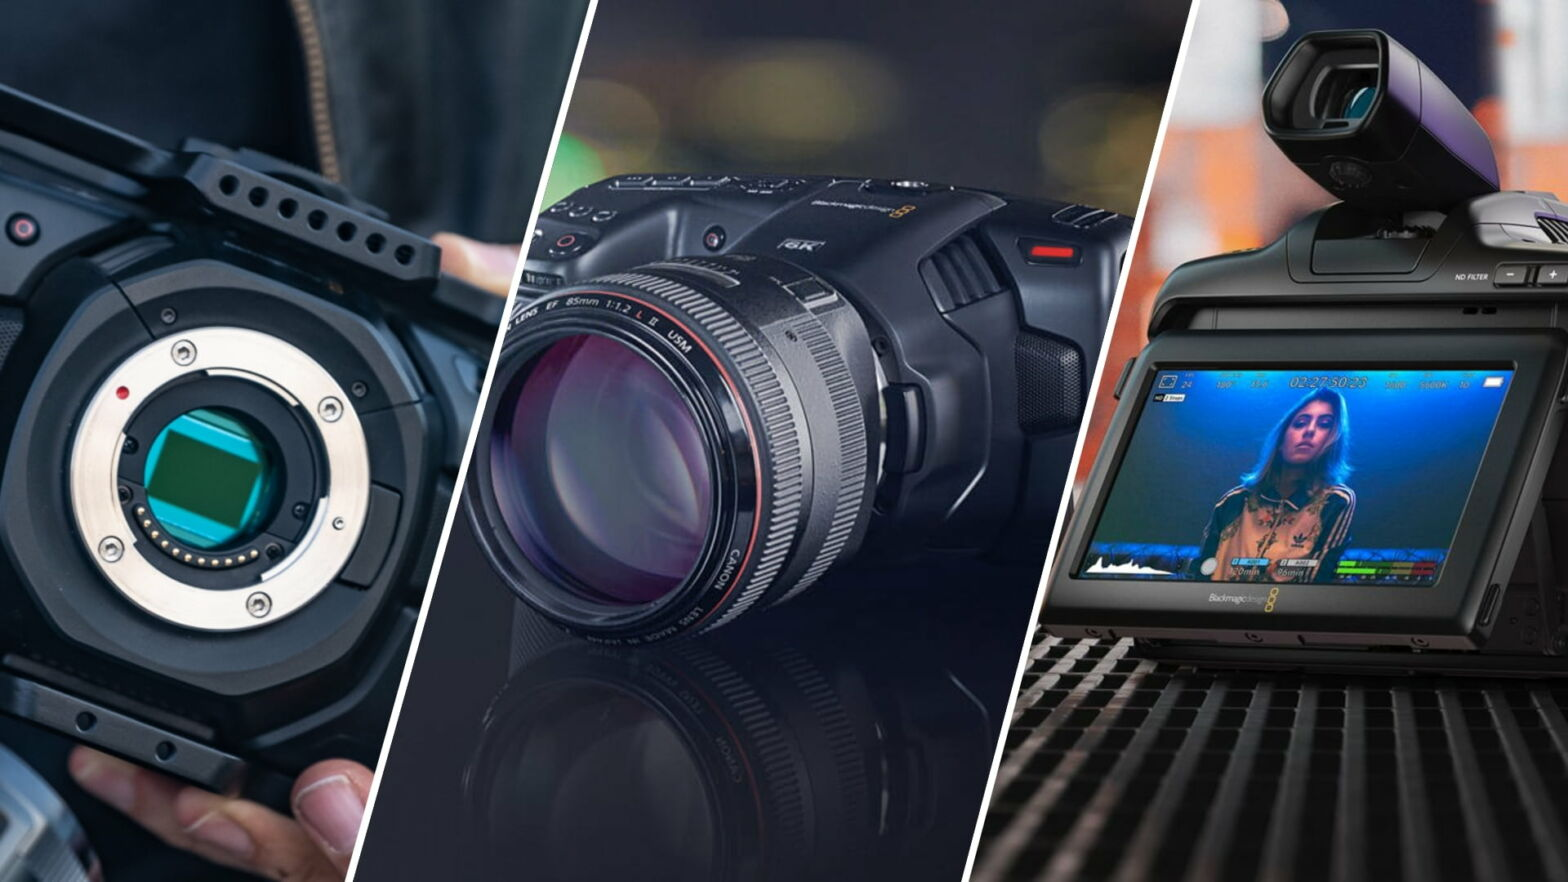 Blackmagic Pocket Cinema Camera k k — Pros Cons Featured